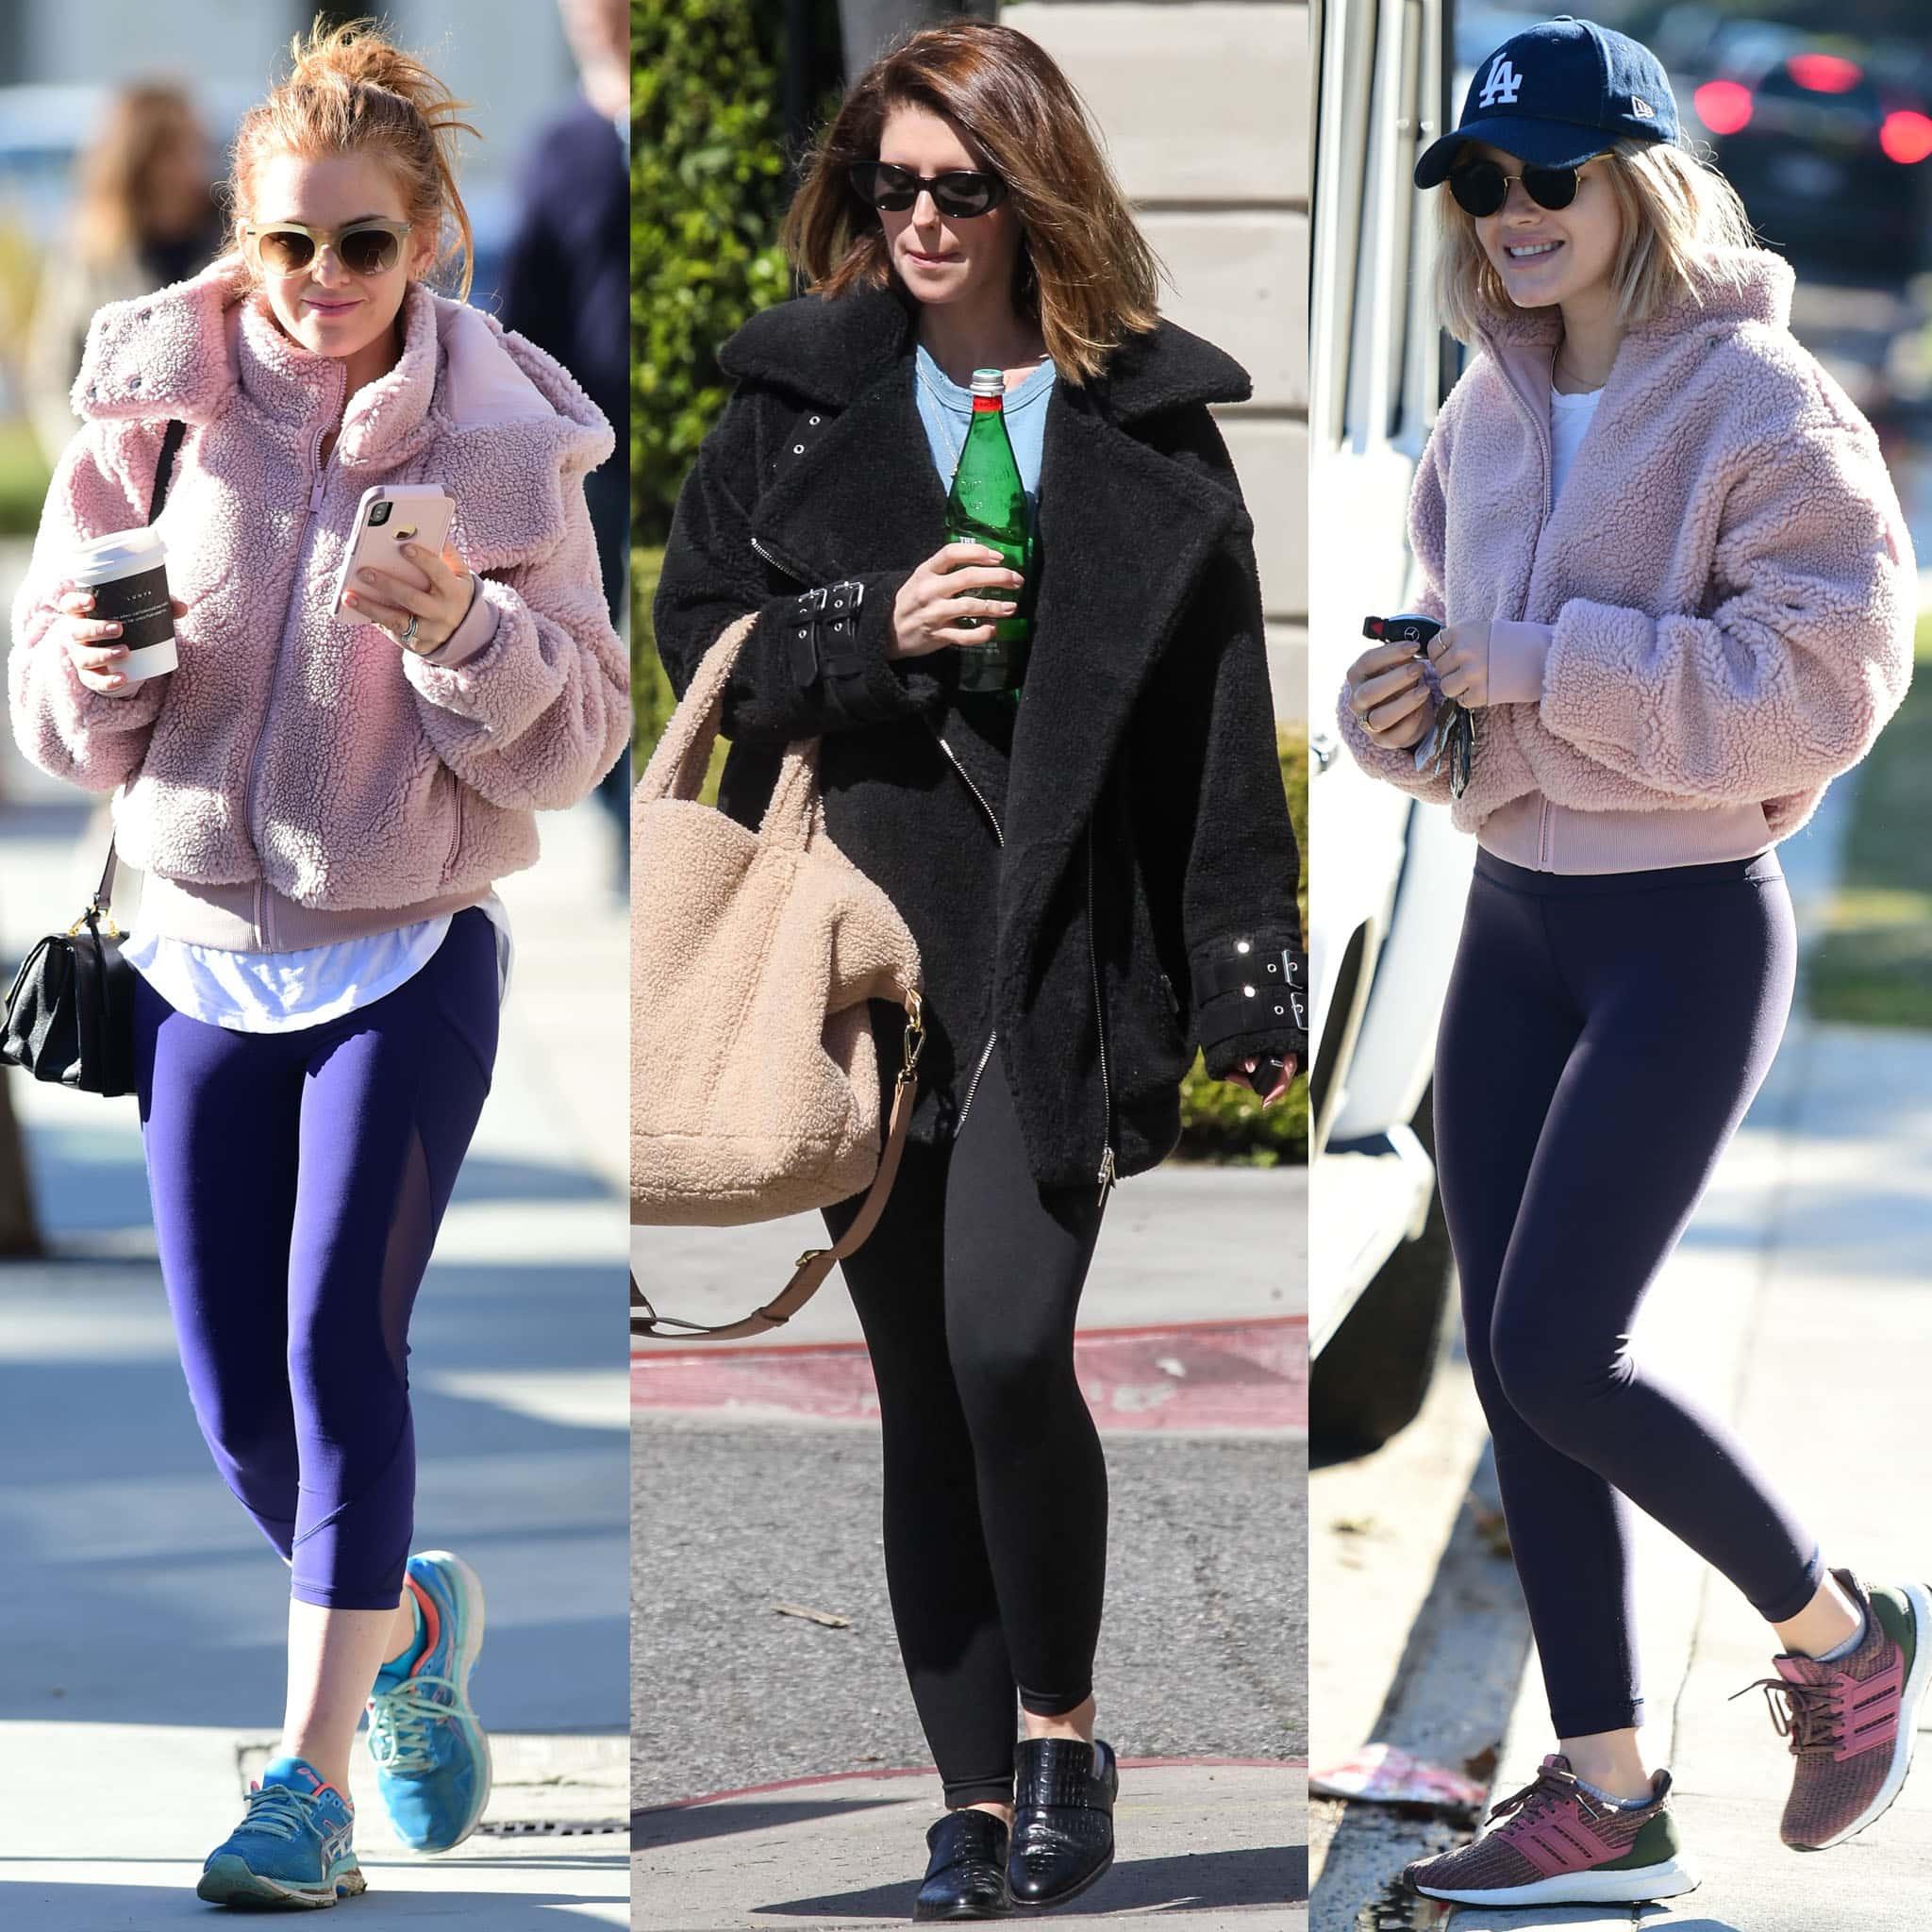 Isla Fisher, Katherine Schwarzenegger, and Lucy Hale wear their fleece jackets with leggings